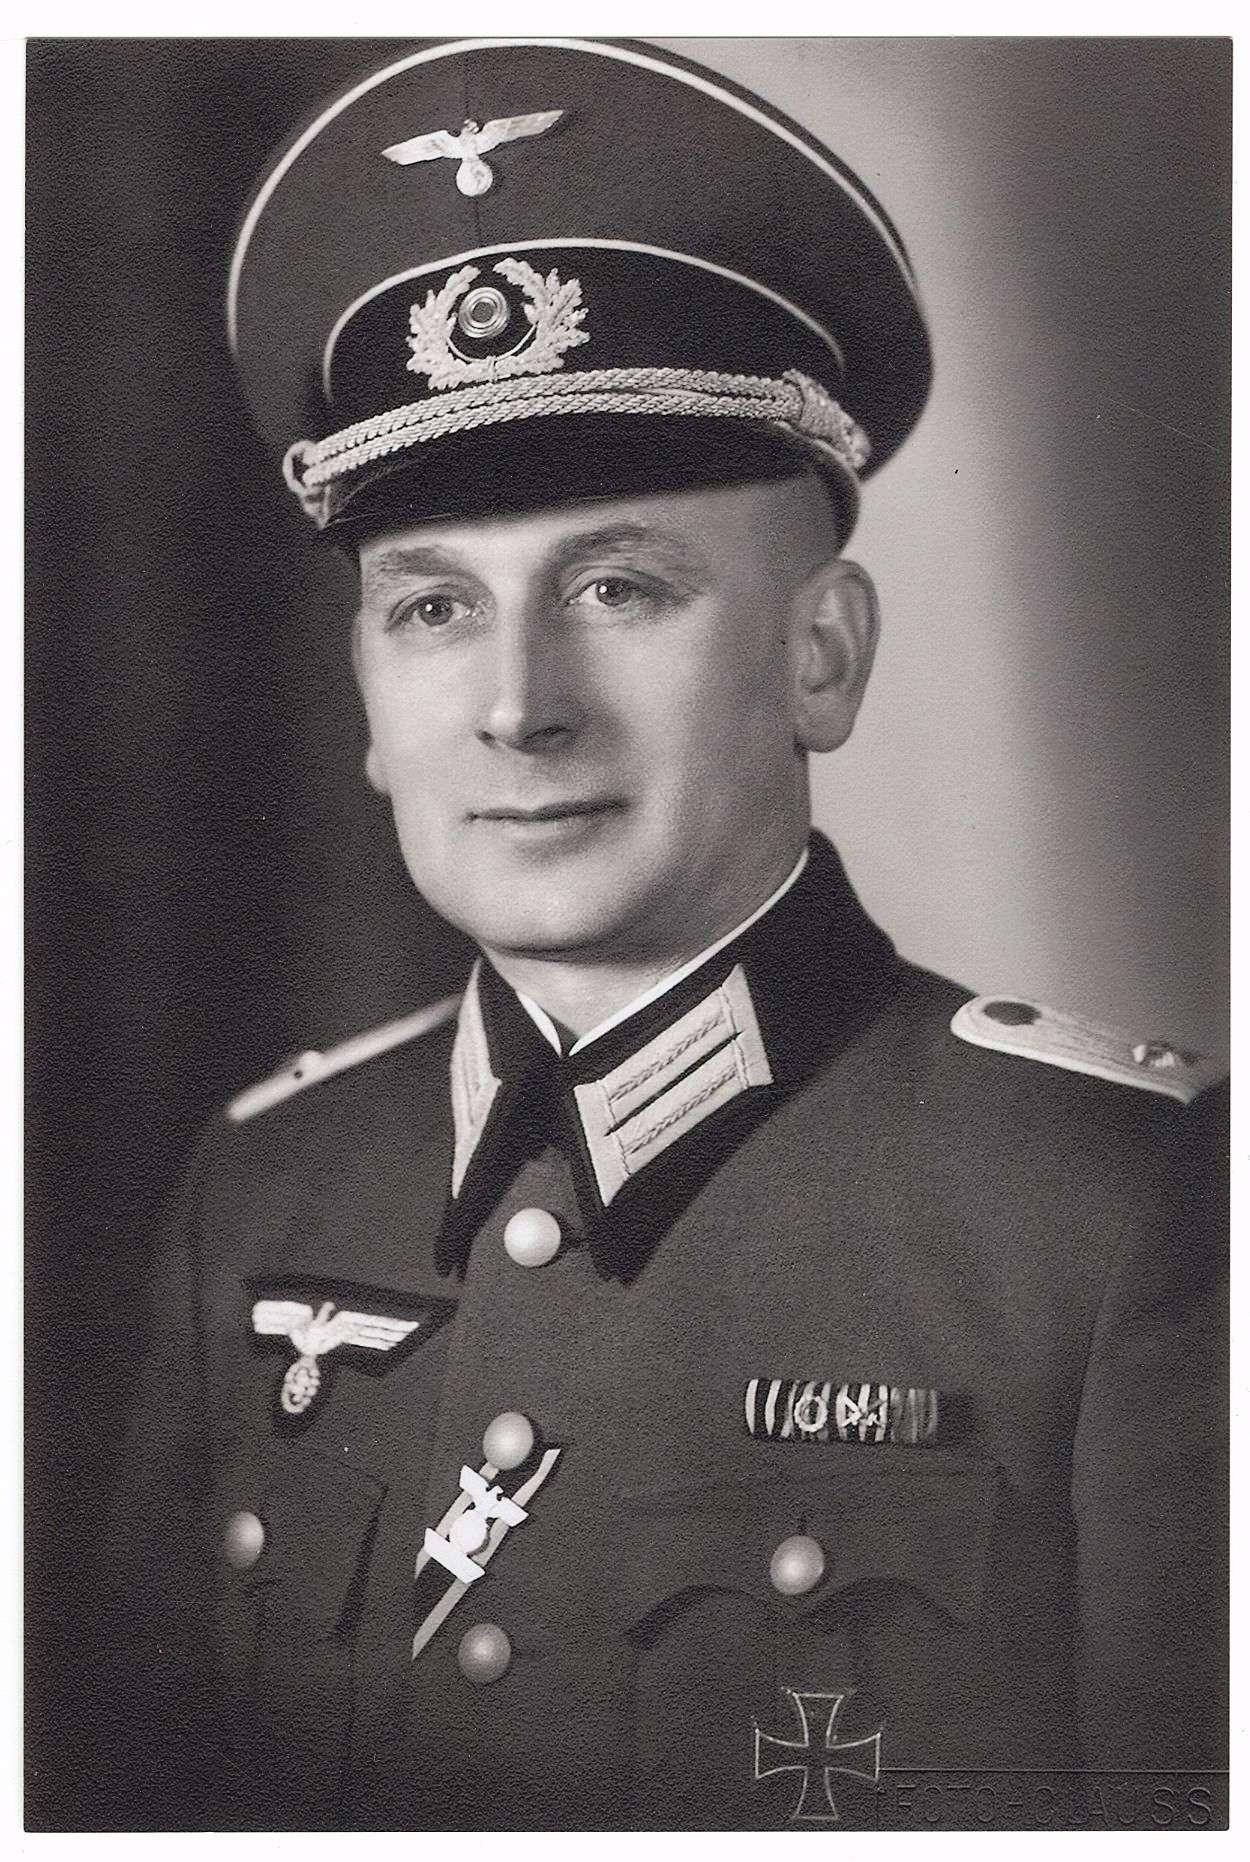 Eisele, Eugen Karl, Bild 3